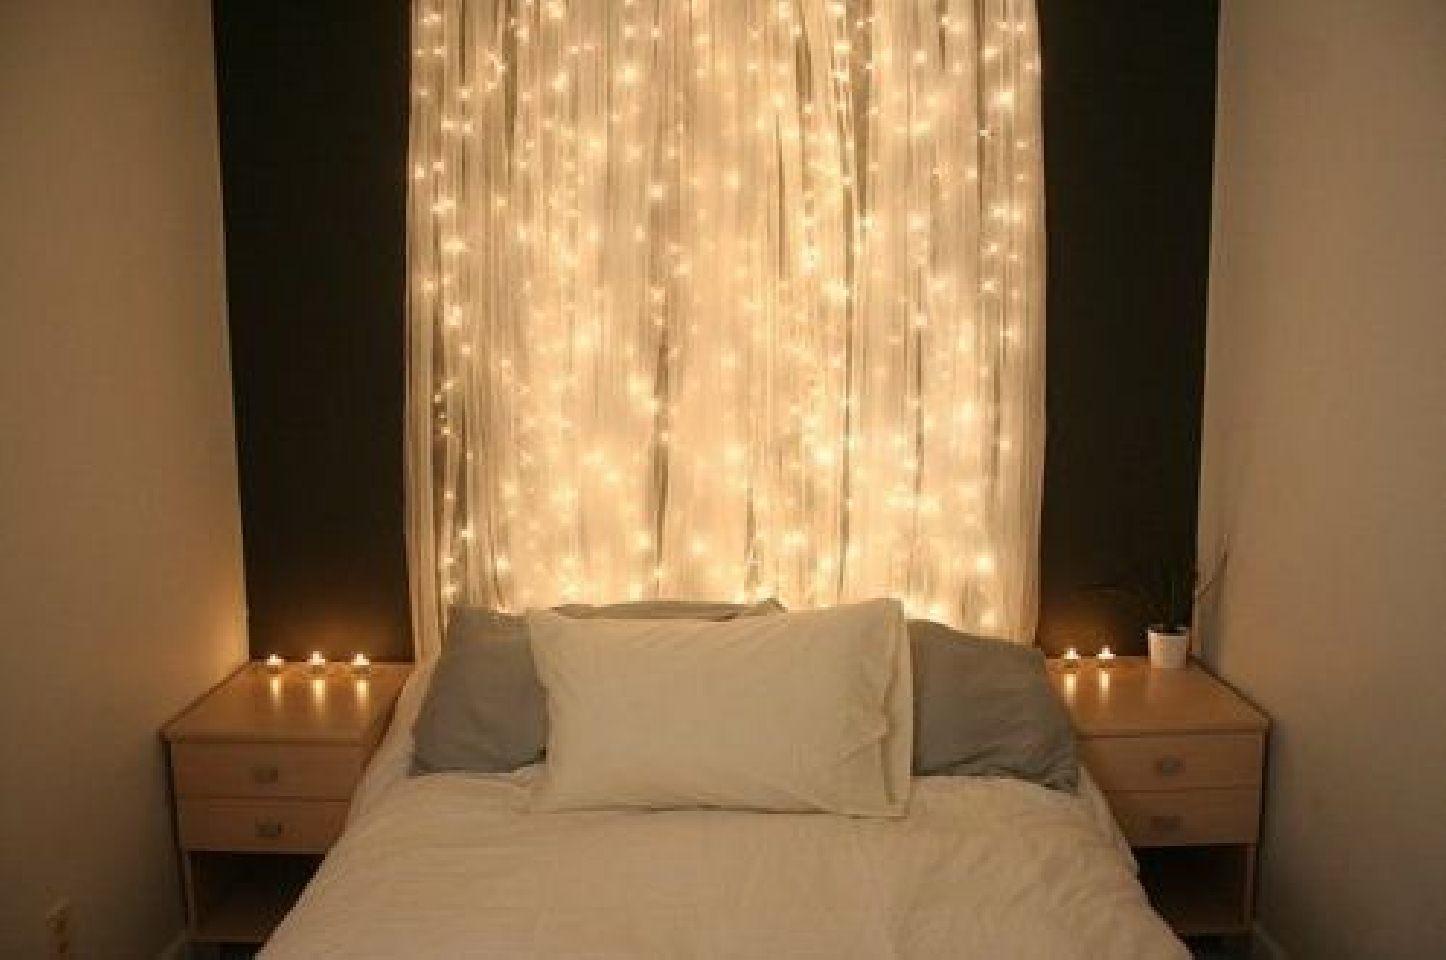 Christmas Lights In Bedroom  30 Christmas Bedroom Decorations Ideas